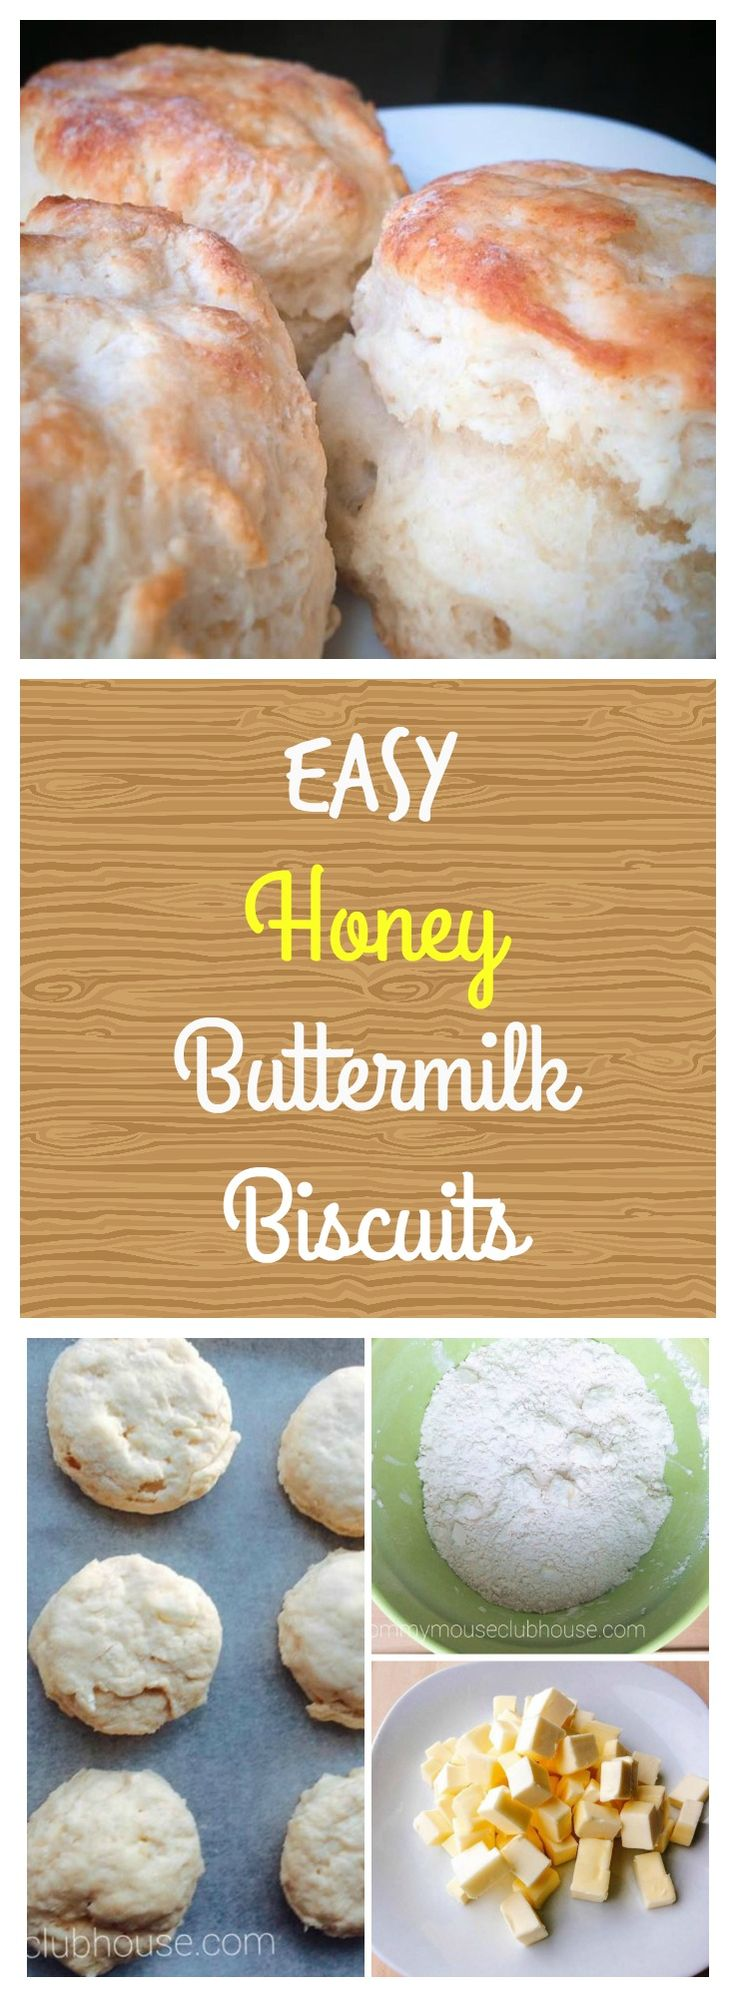 Easy Honey Buttermilk Biscuits  Quick, Easy, Homemade, Biscuits, Breakfast